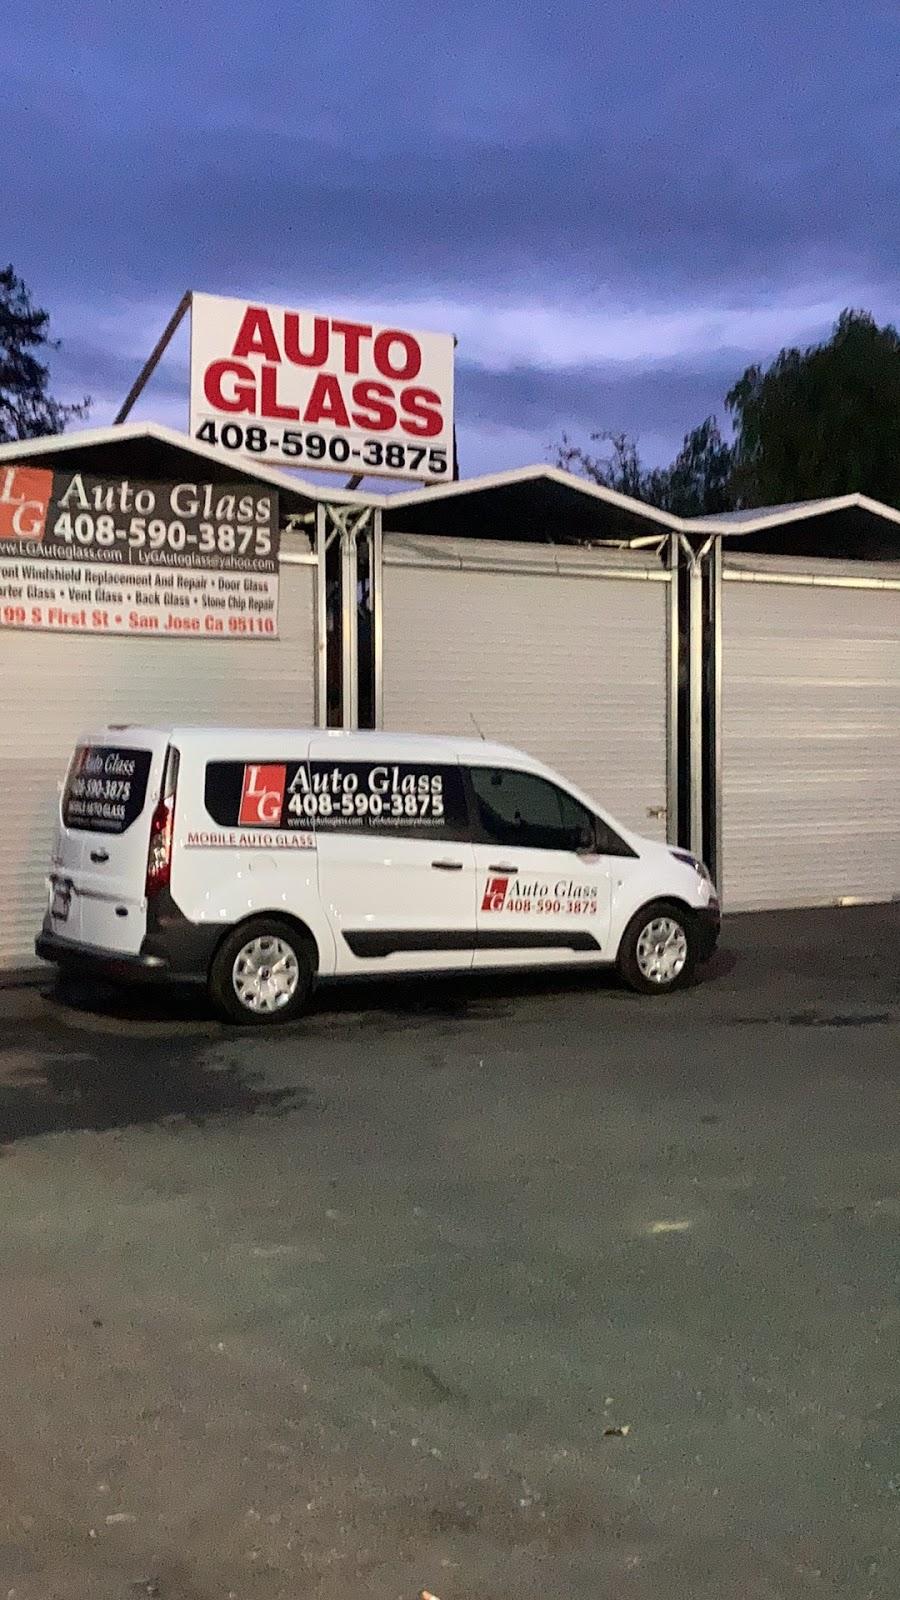 LG Auto Glass - car repair    Photo 3 of 10   Address: 1199 S 1st St, San Jose, CA 95110, USA   Phone: (408) 590-3875